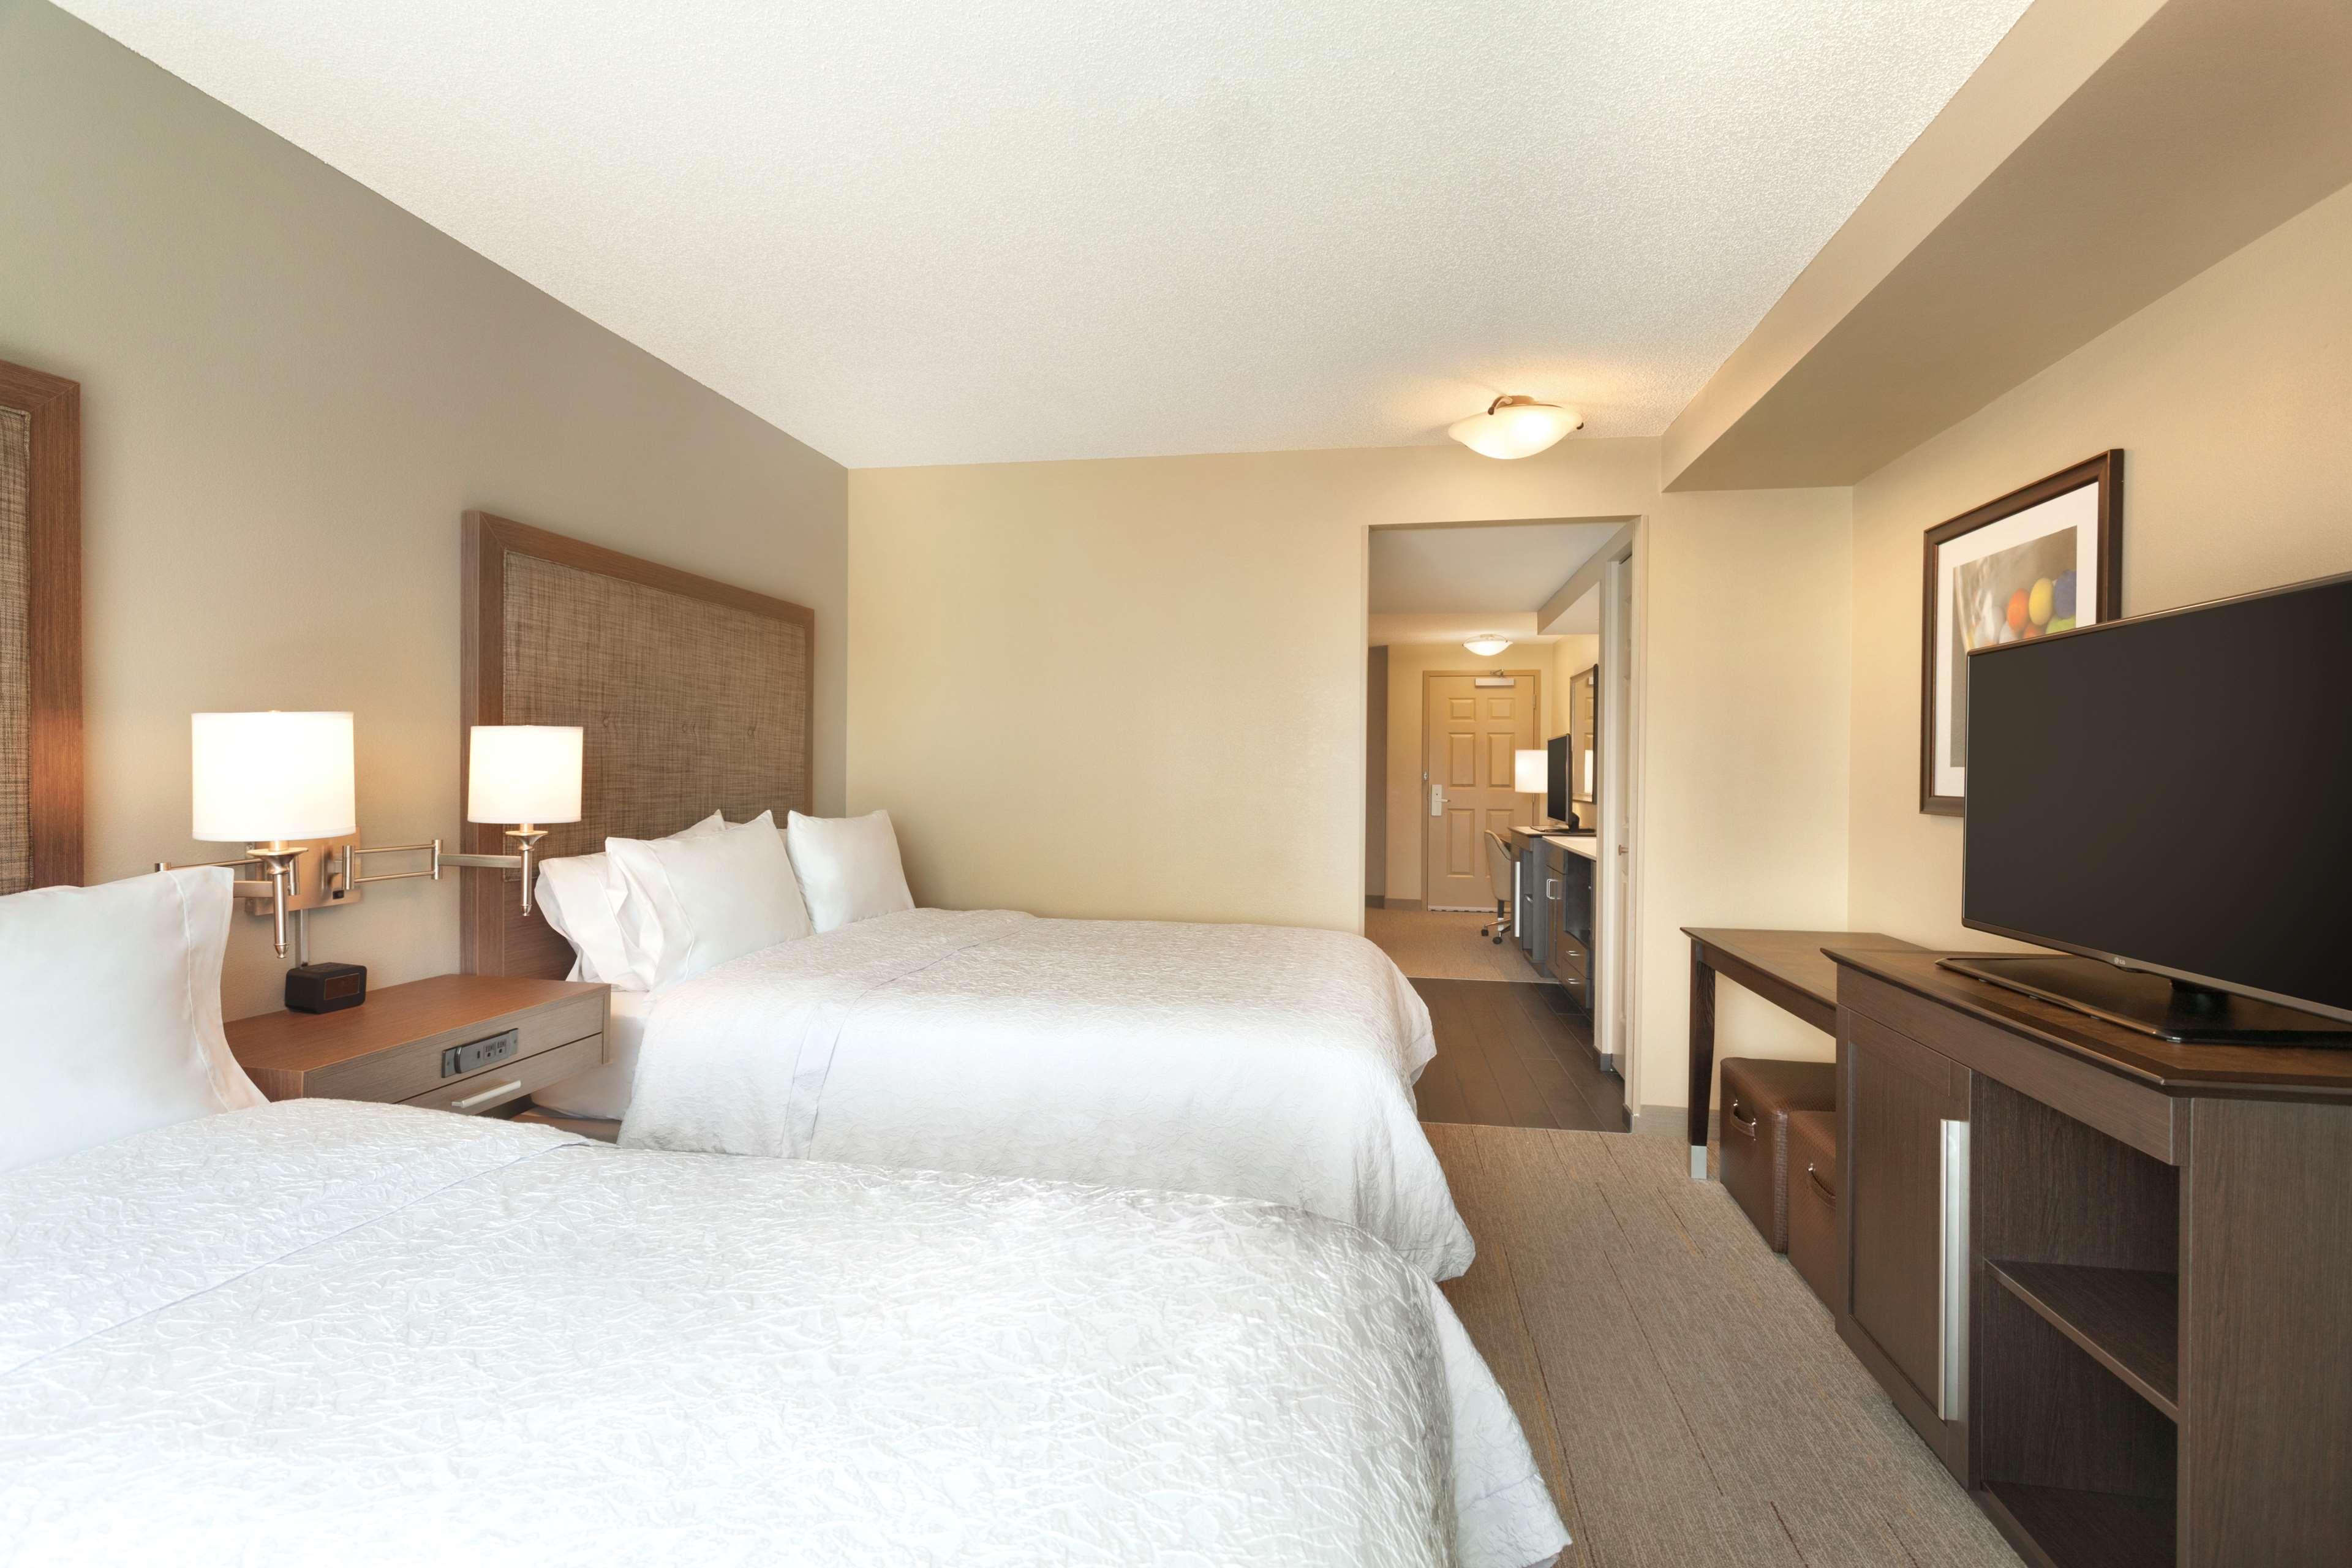 Hampton Inn & Suites Hershey Near The Park image 16